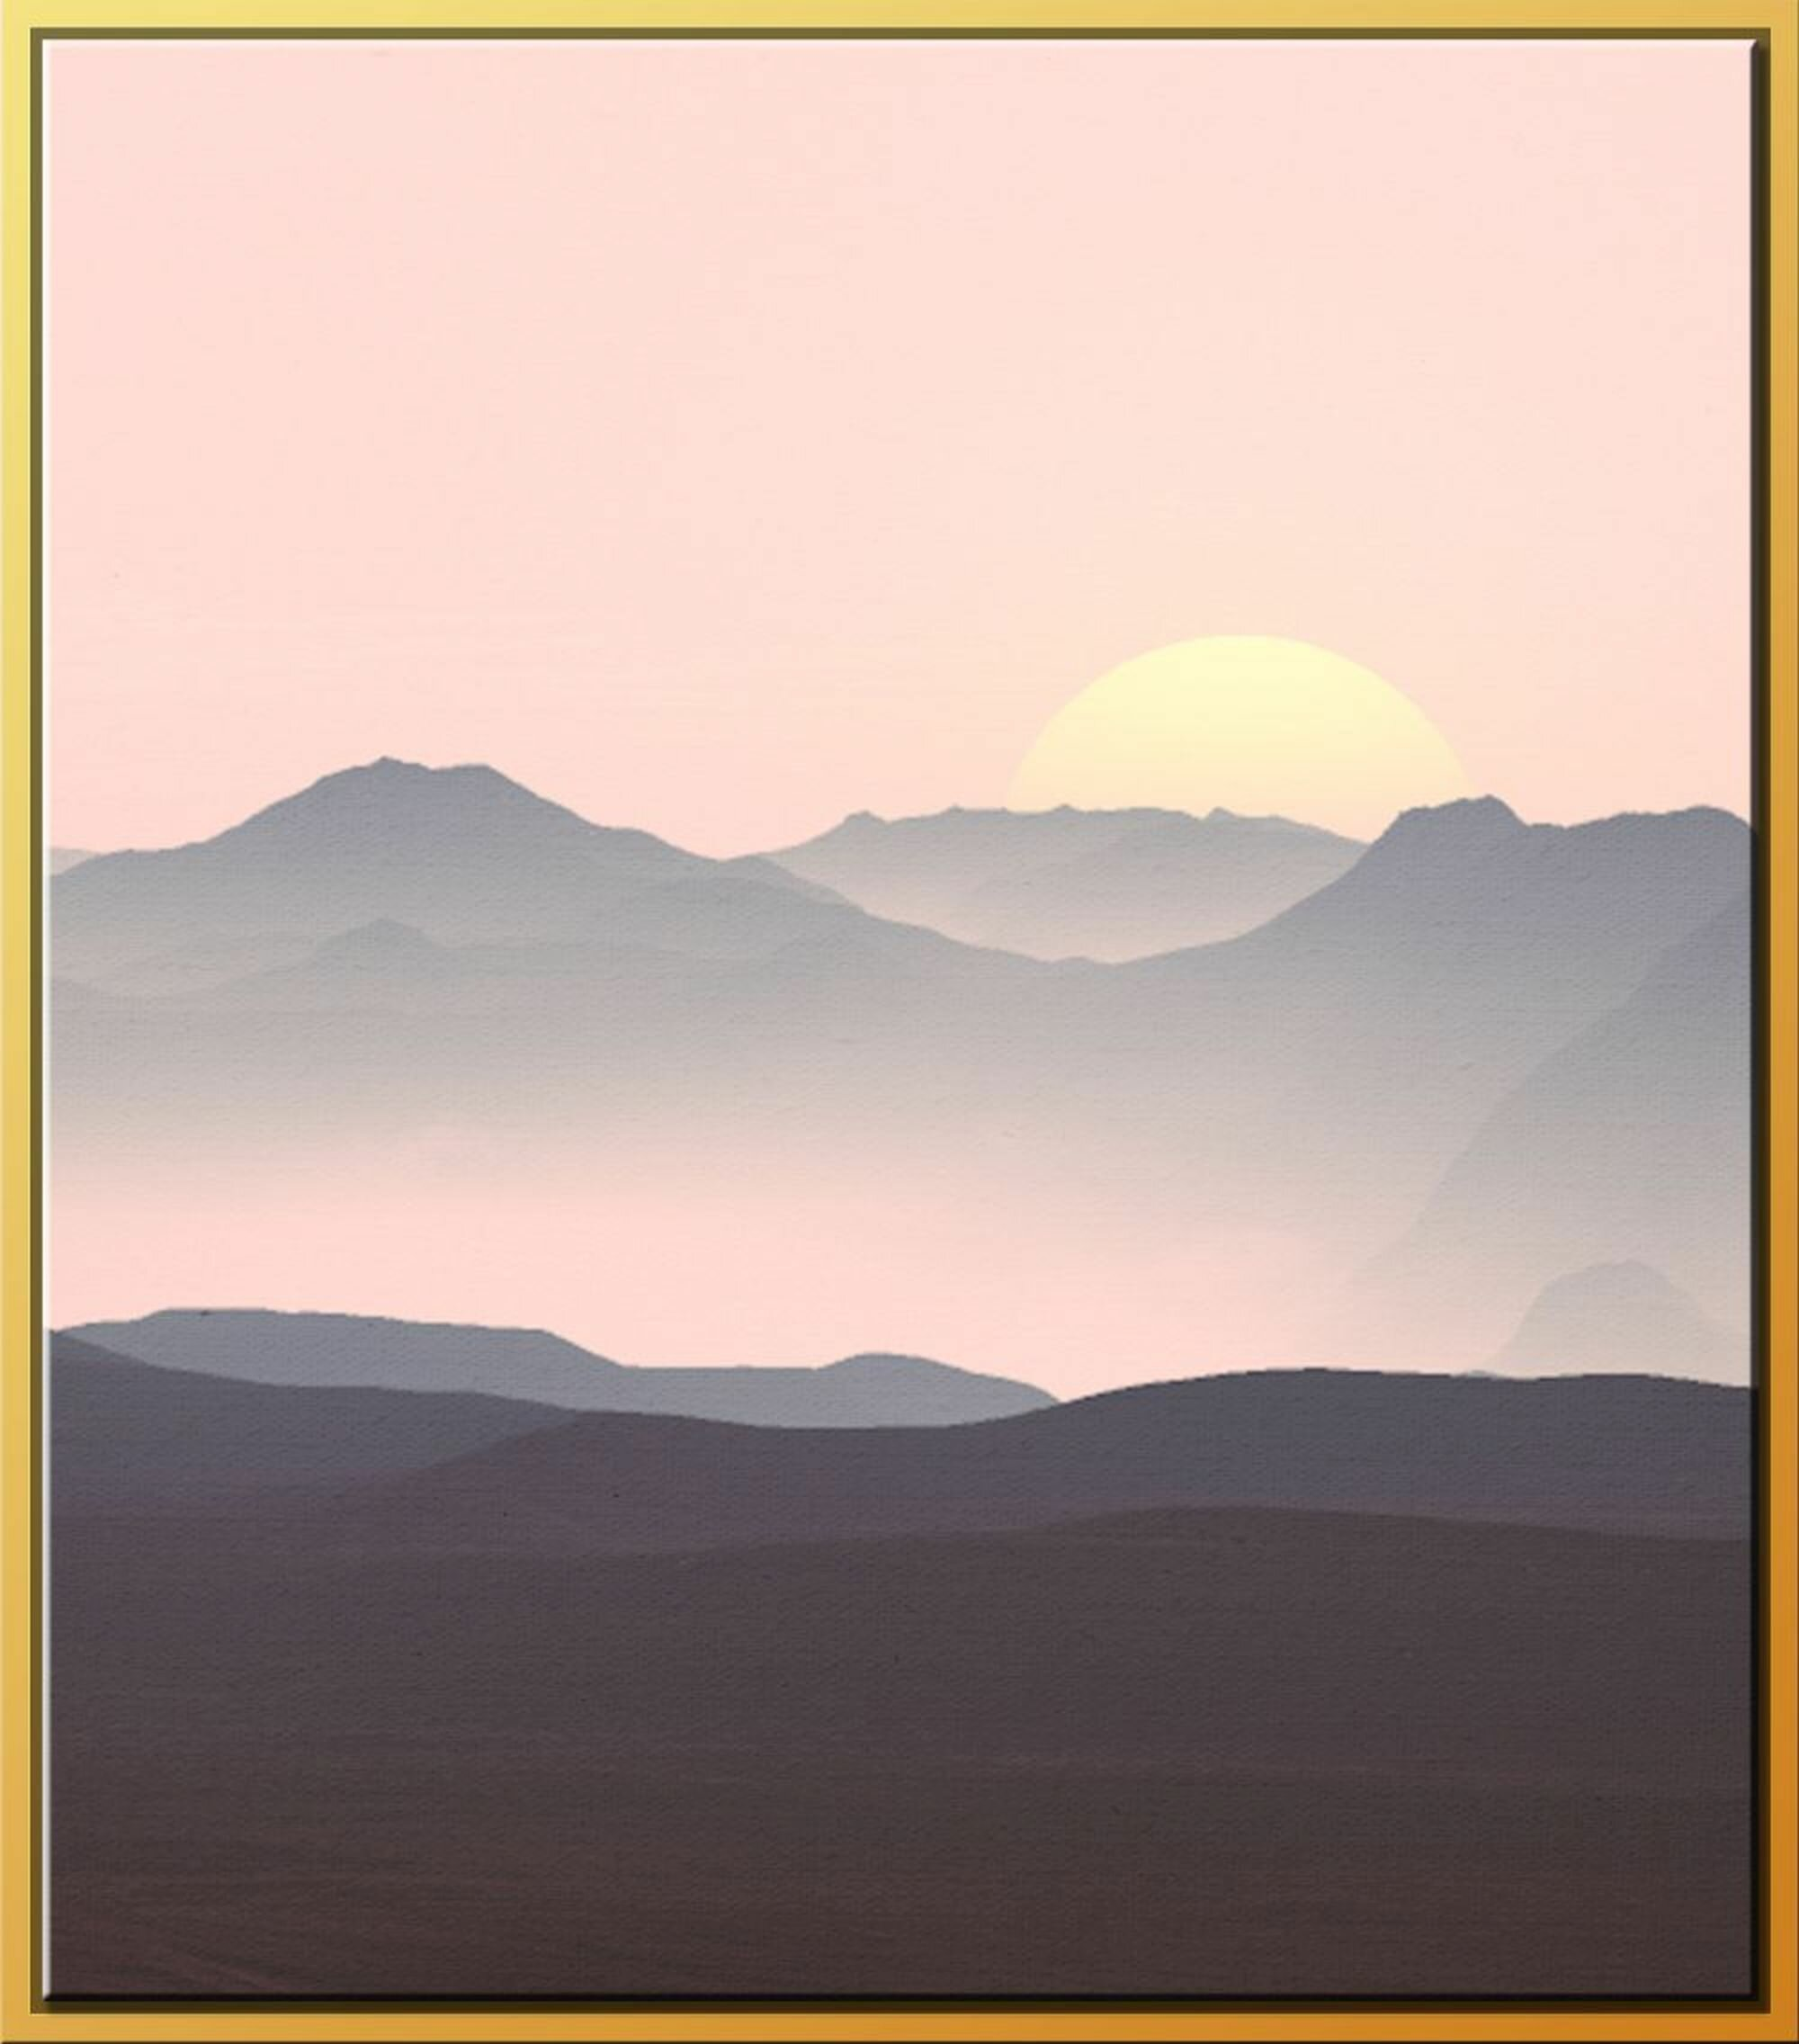 Ivy Bronx Navy Pink Sunset Ii Framed Graphic Art On Canvas Wayfair